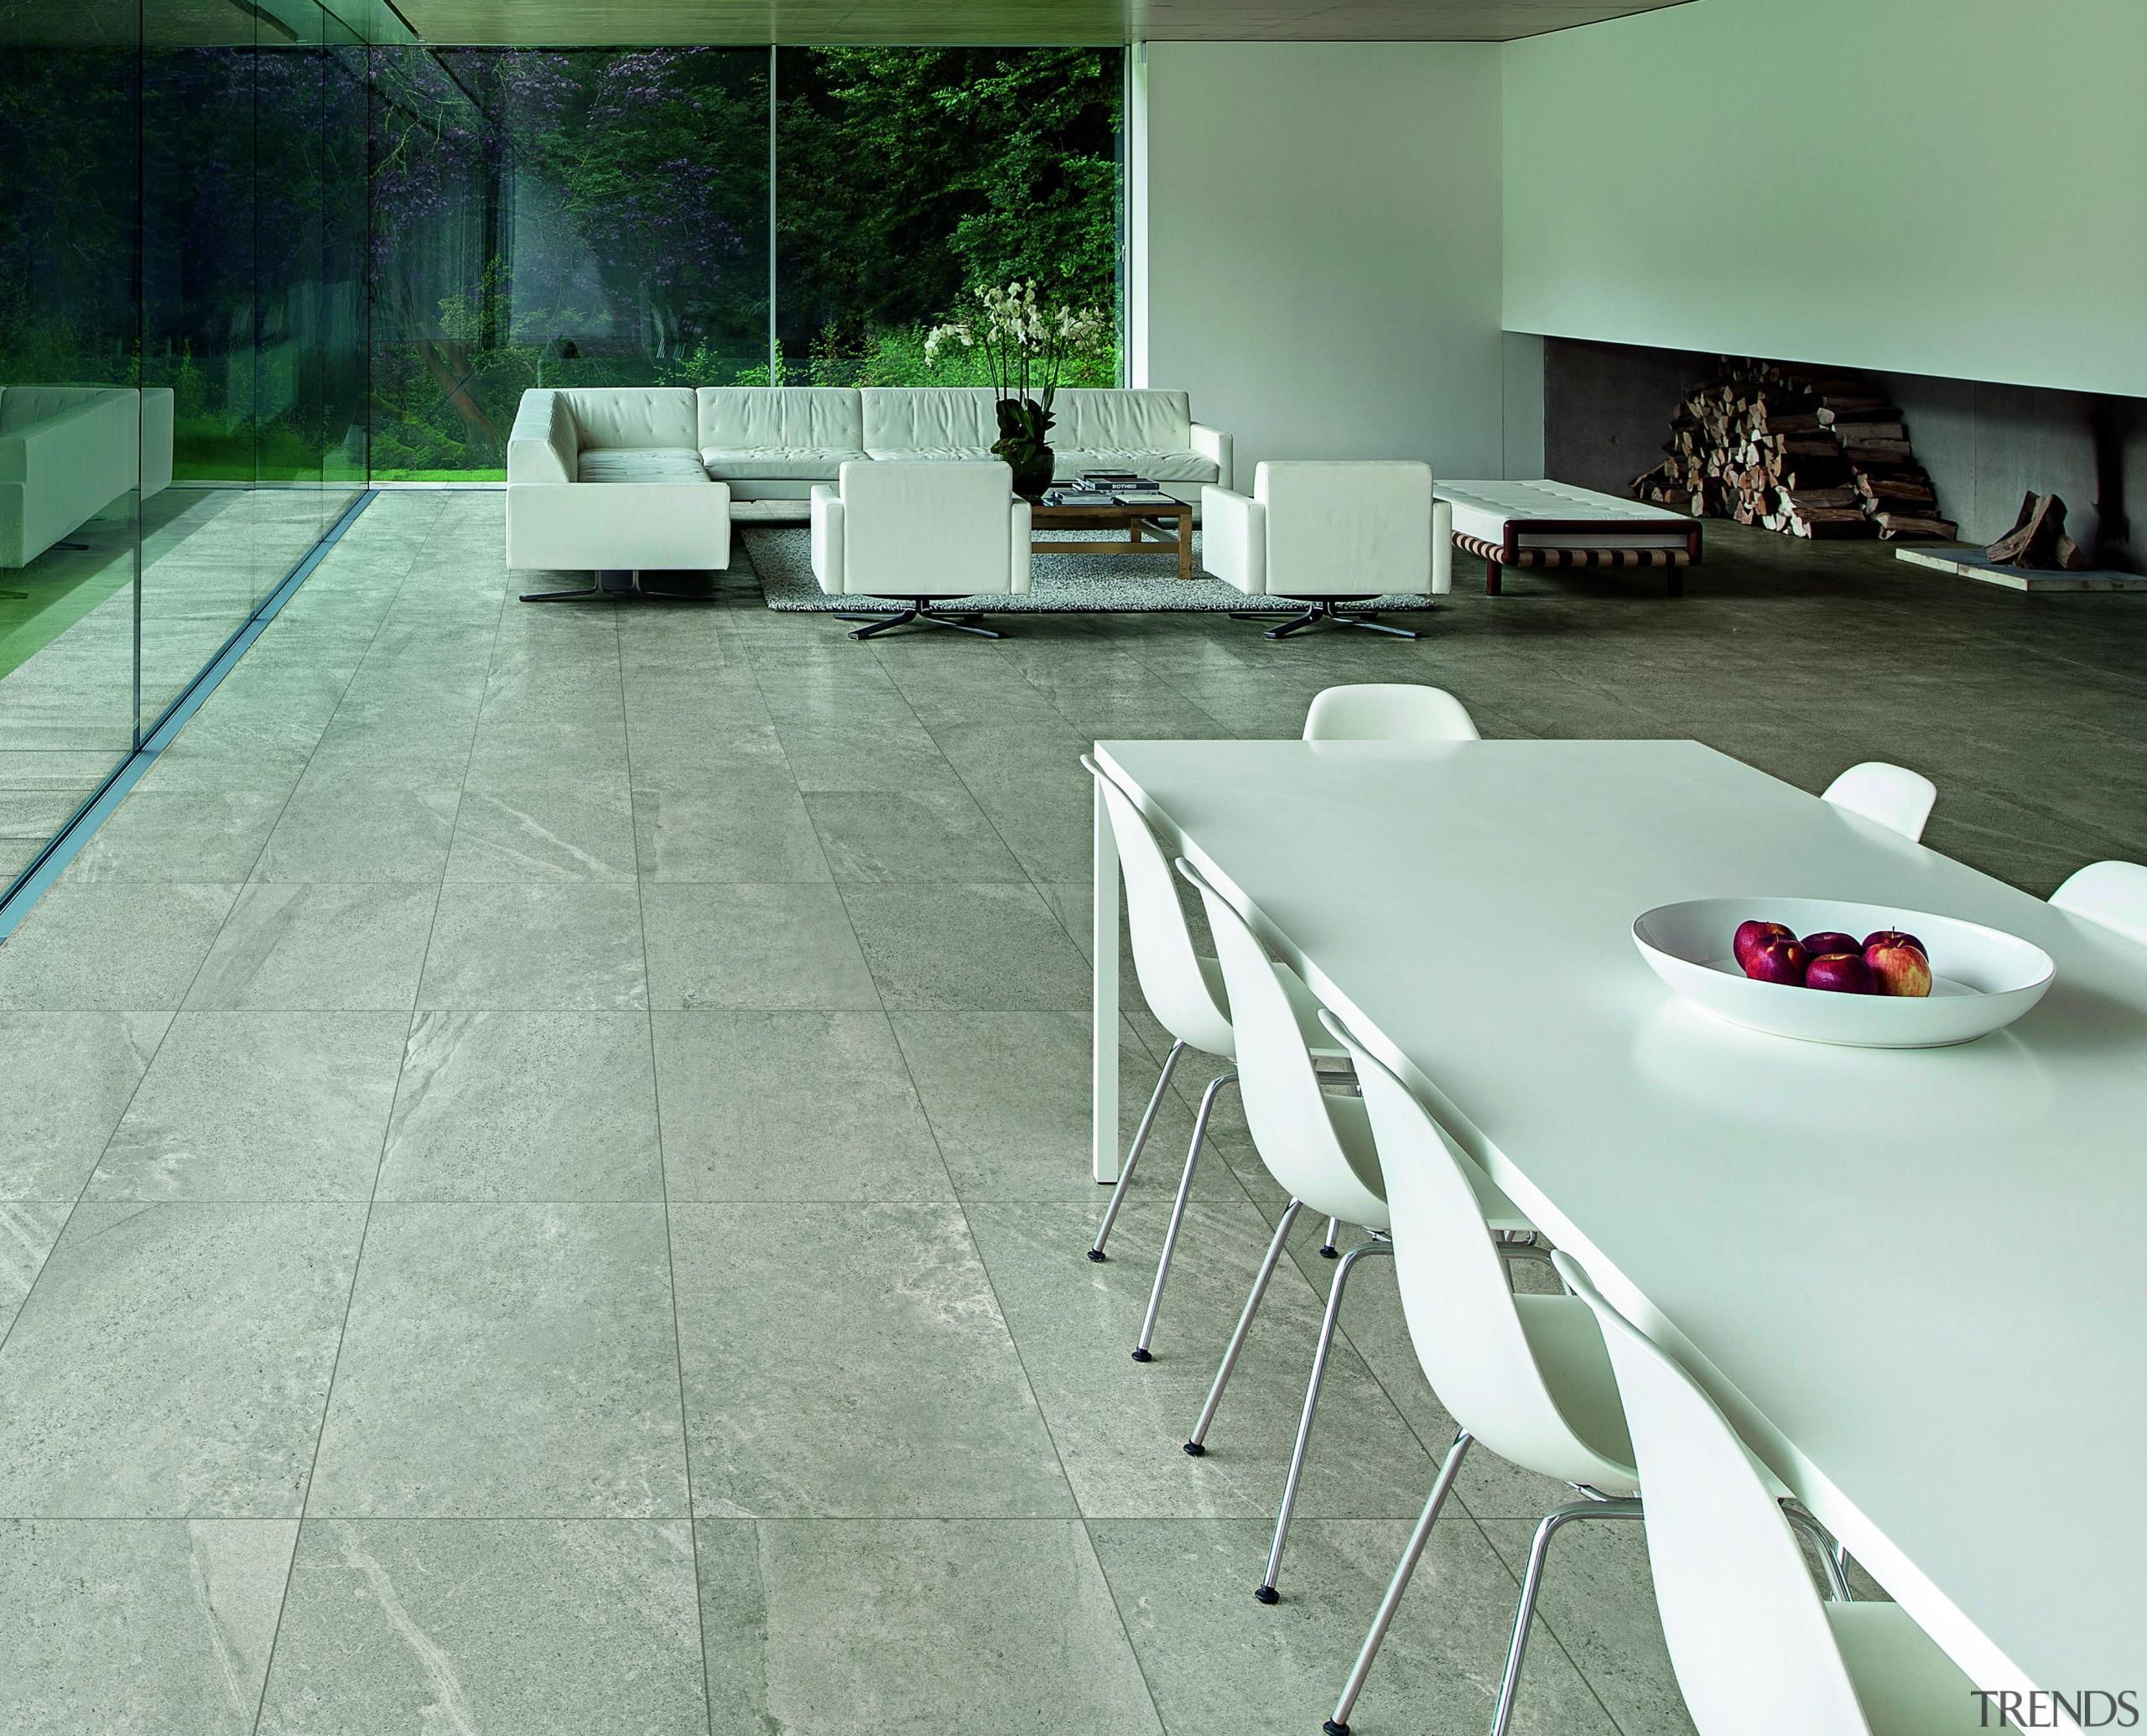 Blendstone grey living area interior floor tile - architecture, chair, floor, flooring, furniture, interior design, product design, table, tile, gray, green